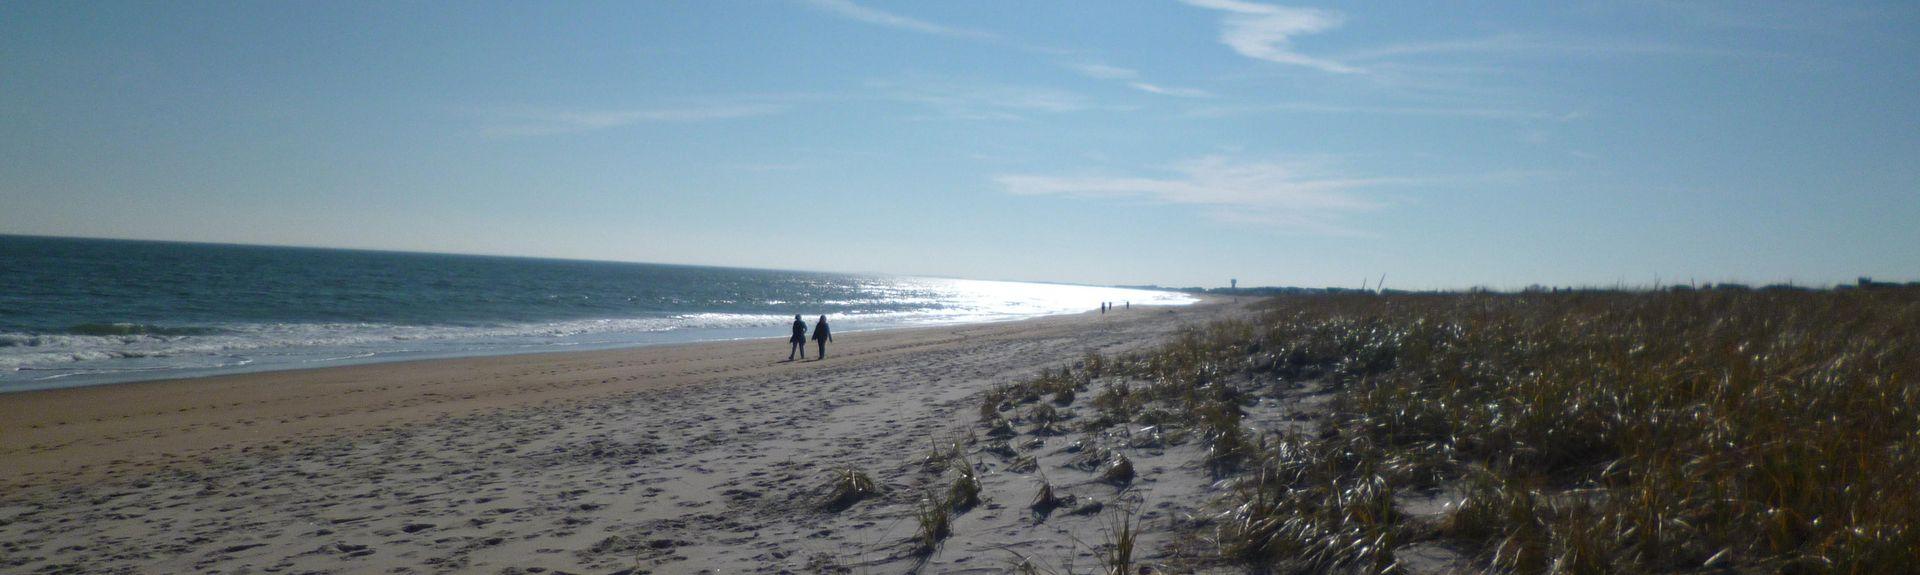 Seabrook Beach, Seabrook, NH, USA